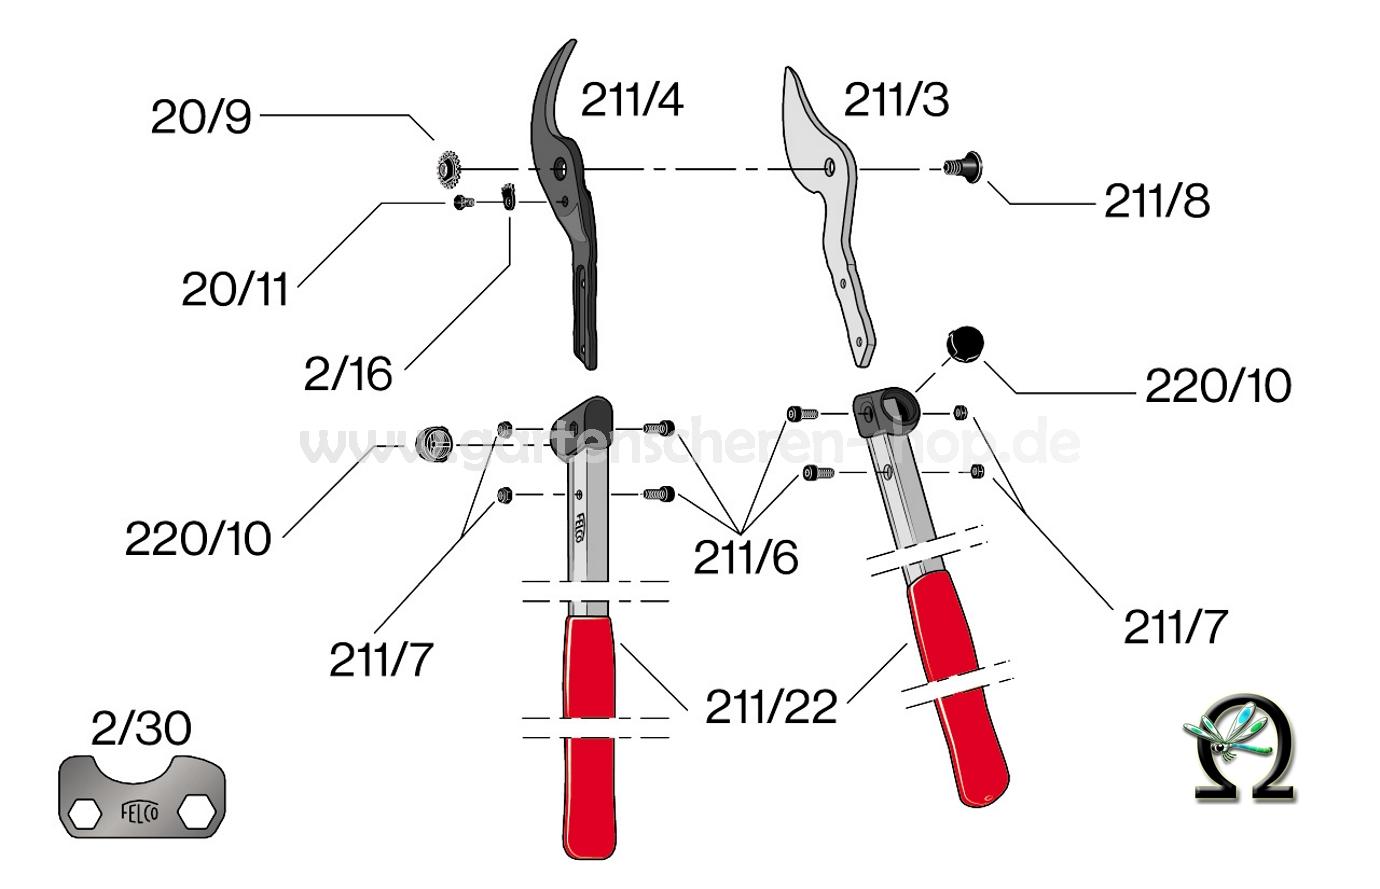 felco-211-40-explosionszeichnung